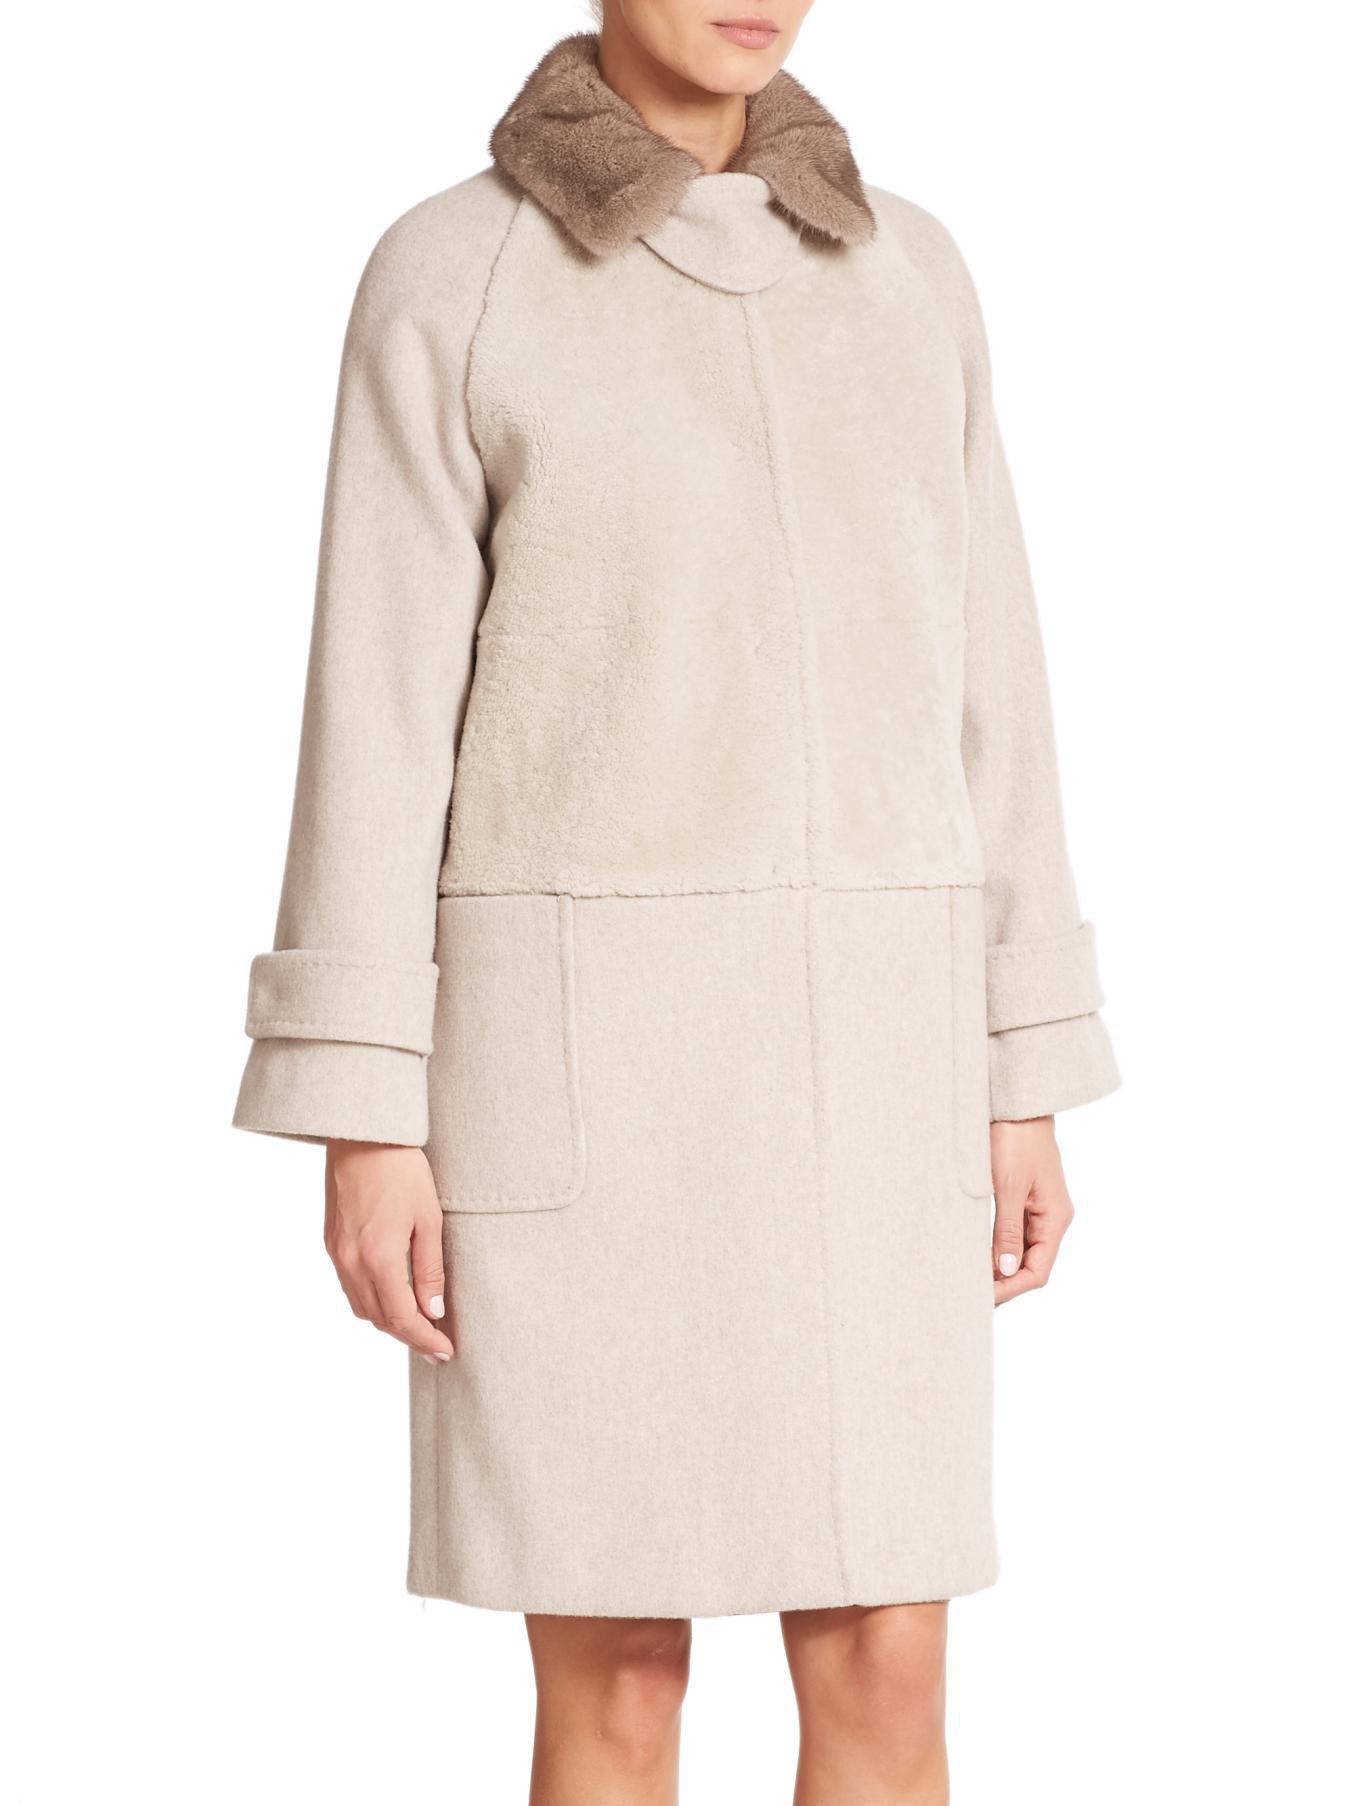 Max mara Bolero Mink-collared Shearling & Wool/cashmere Coat in ...